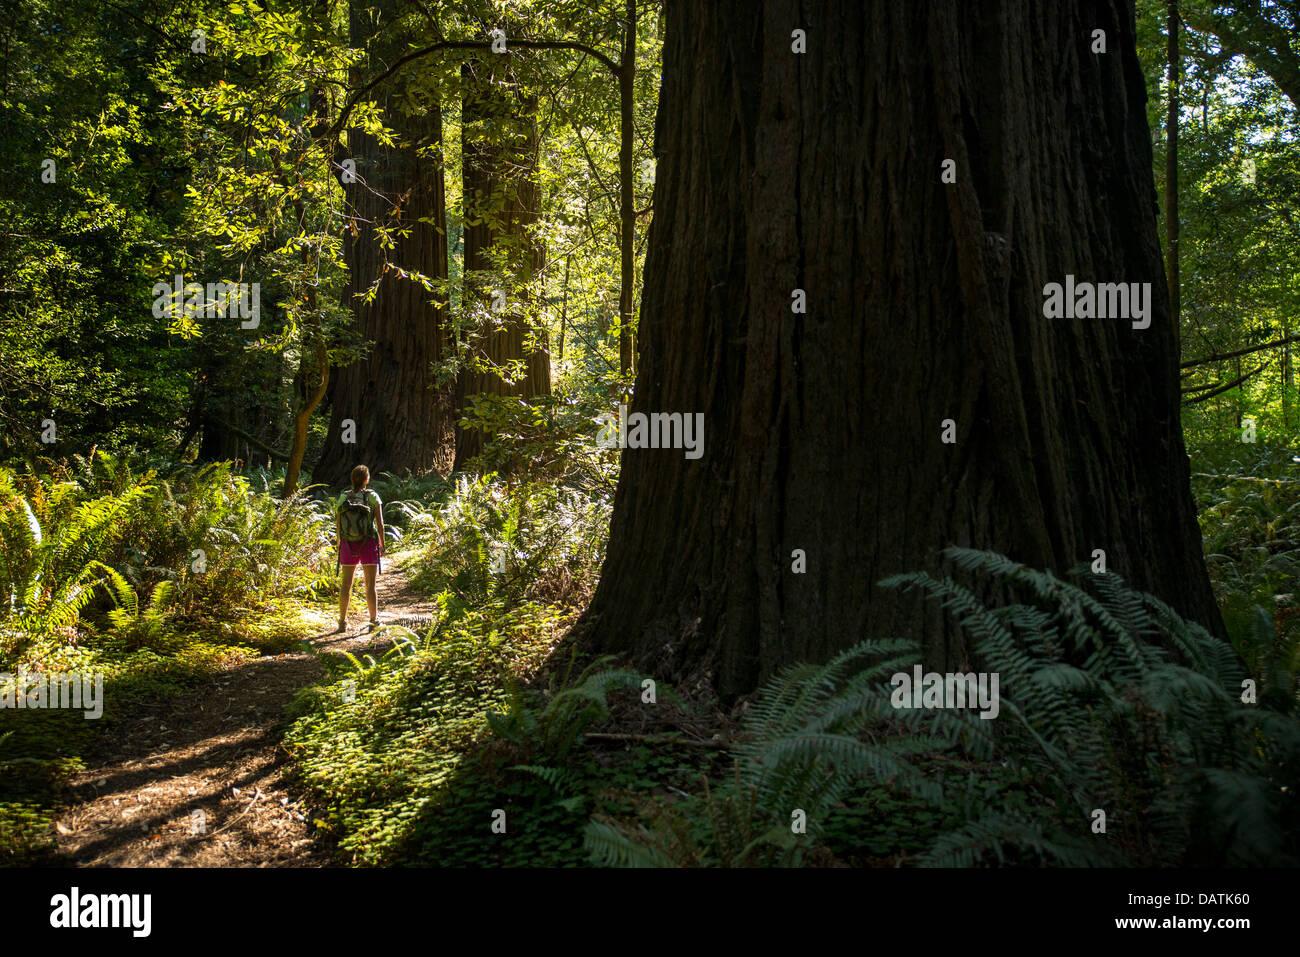 Hiker in Tall Trees Grove, Prairie Creek Redwoods State Park, Orick, California - Stock Image